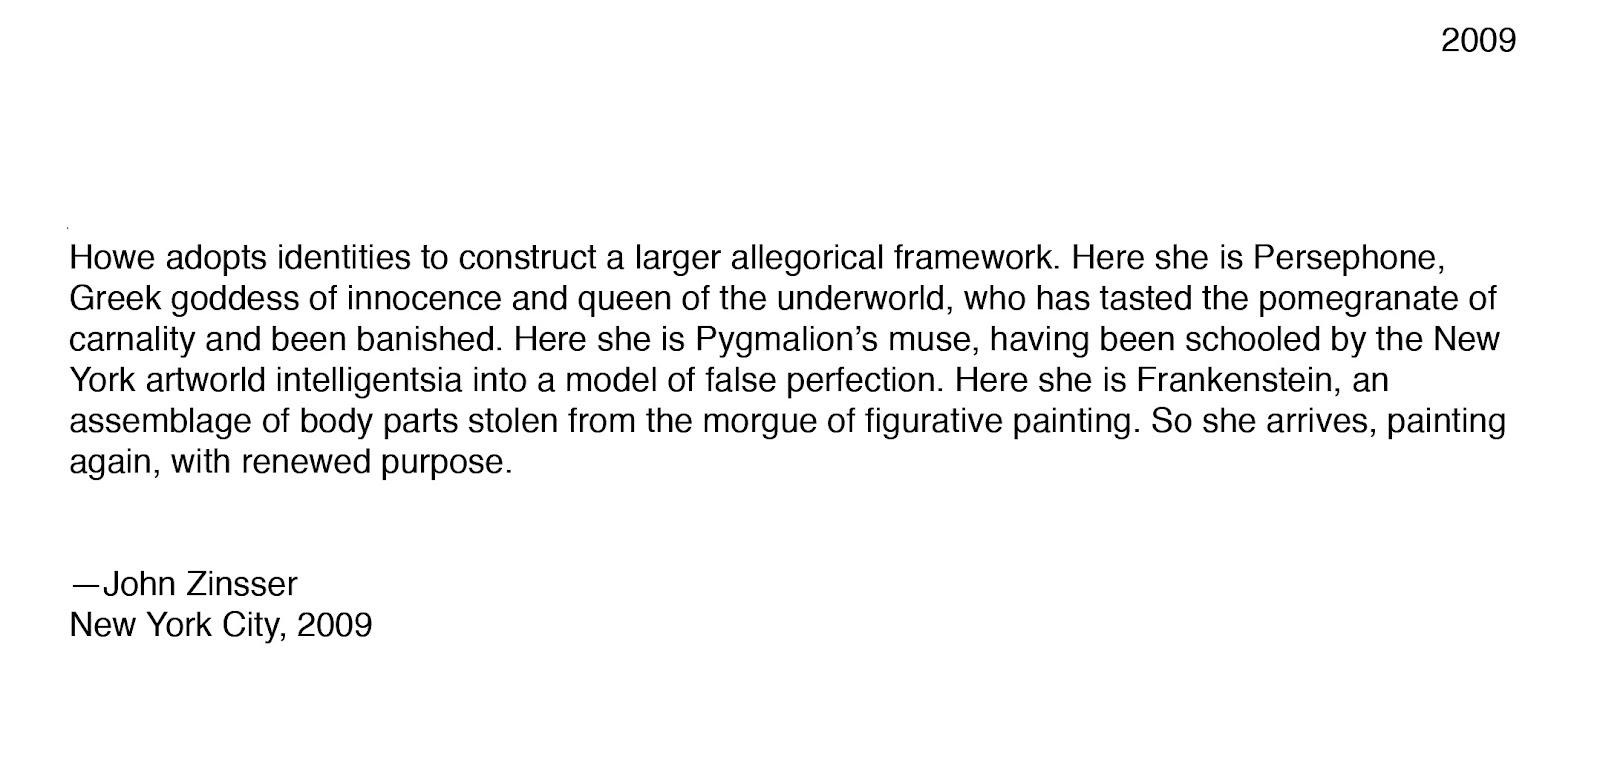 leadership term paper help sample leadership essay mehrfache partielle integration beispiel essay